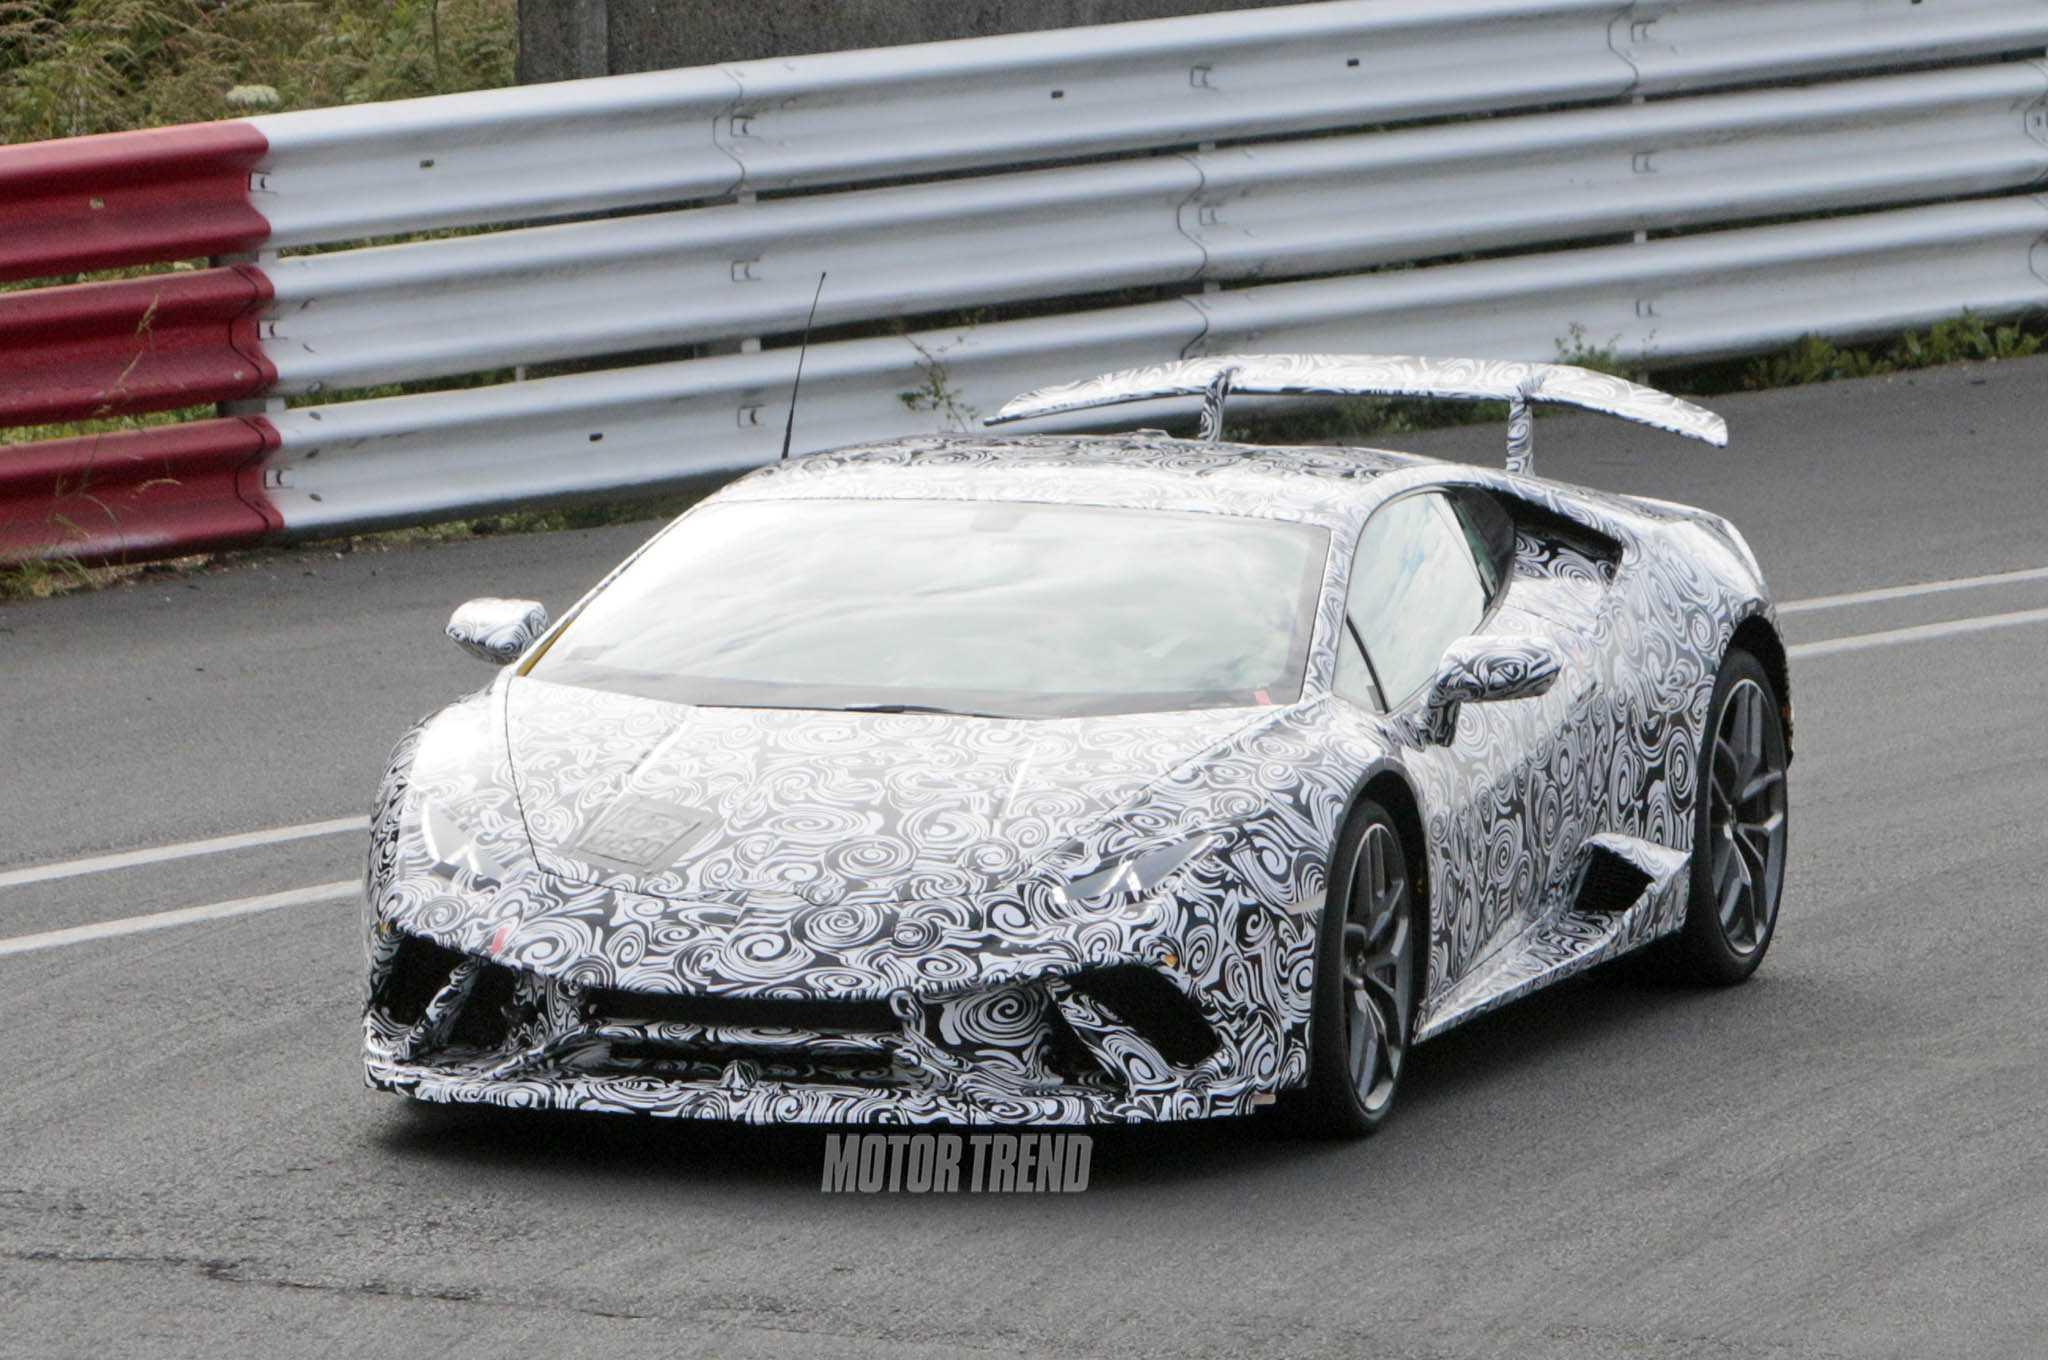 Lamborghini Huracan Superleggera Spied Testing In The Ring